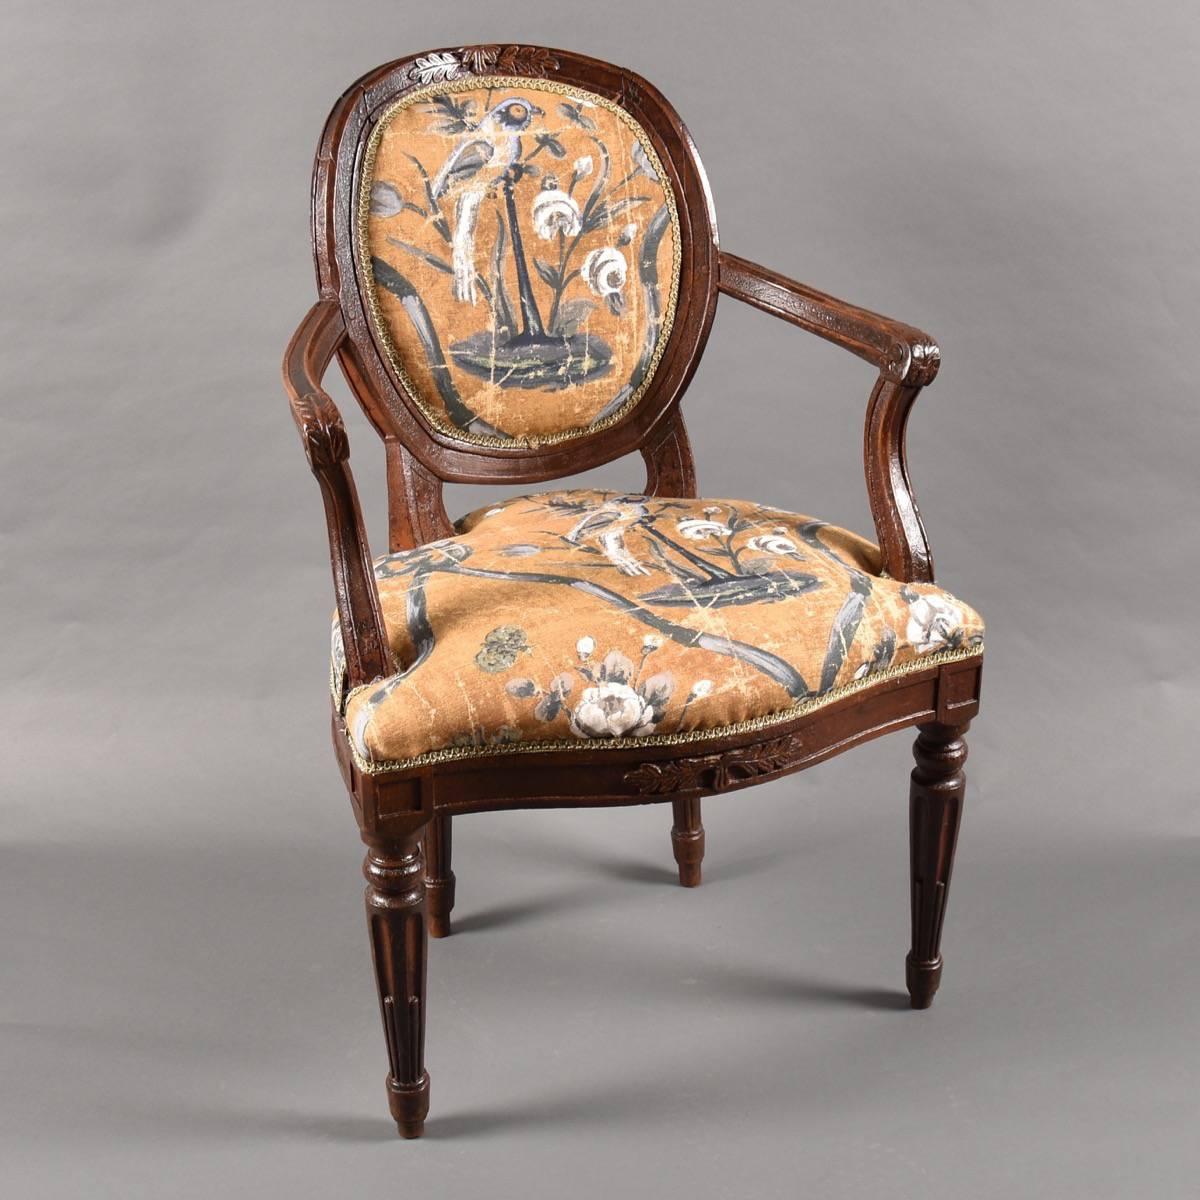 Antique Furniture: De Grande French Antique Furniture